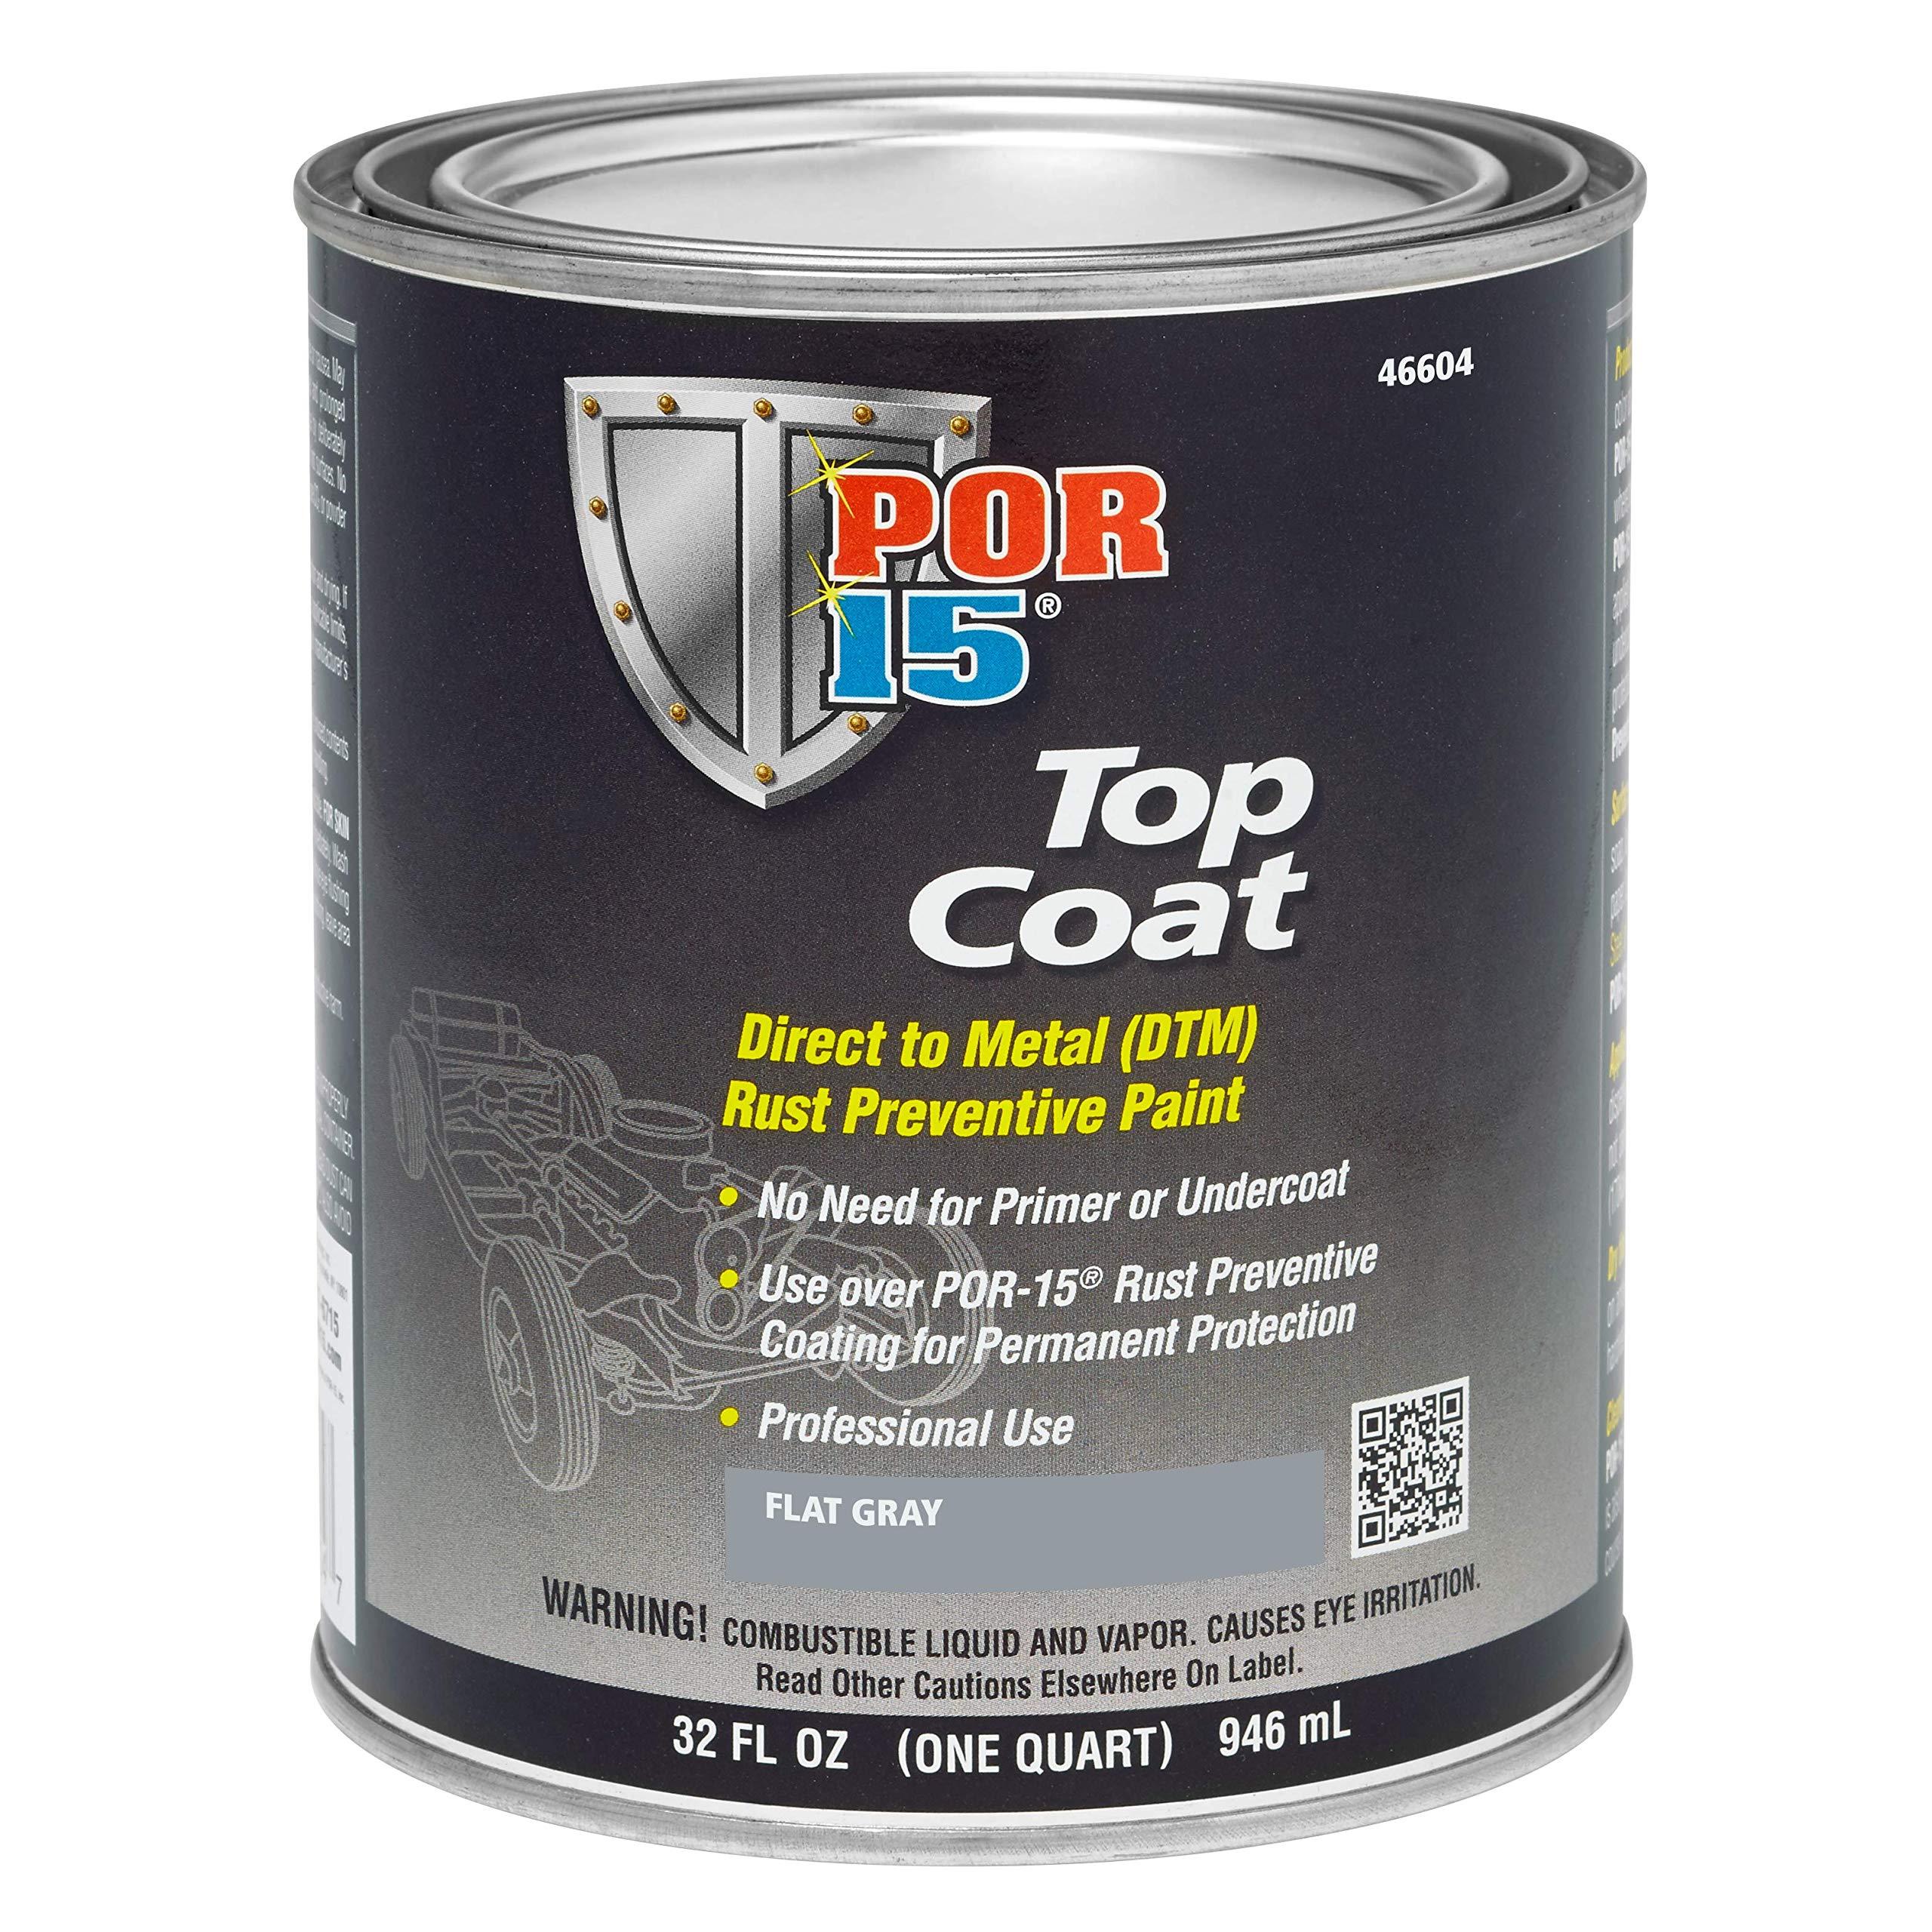 POR-15 46604 Top Coat Flat Gray Paint, 32. Fluid_Ounces